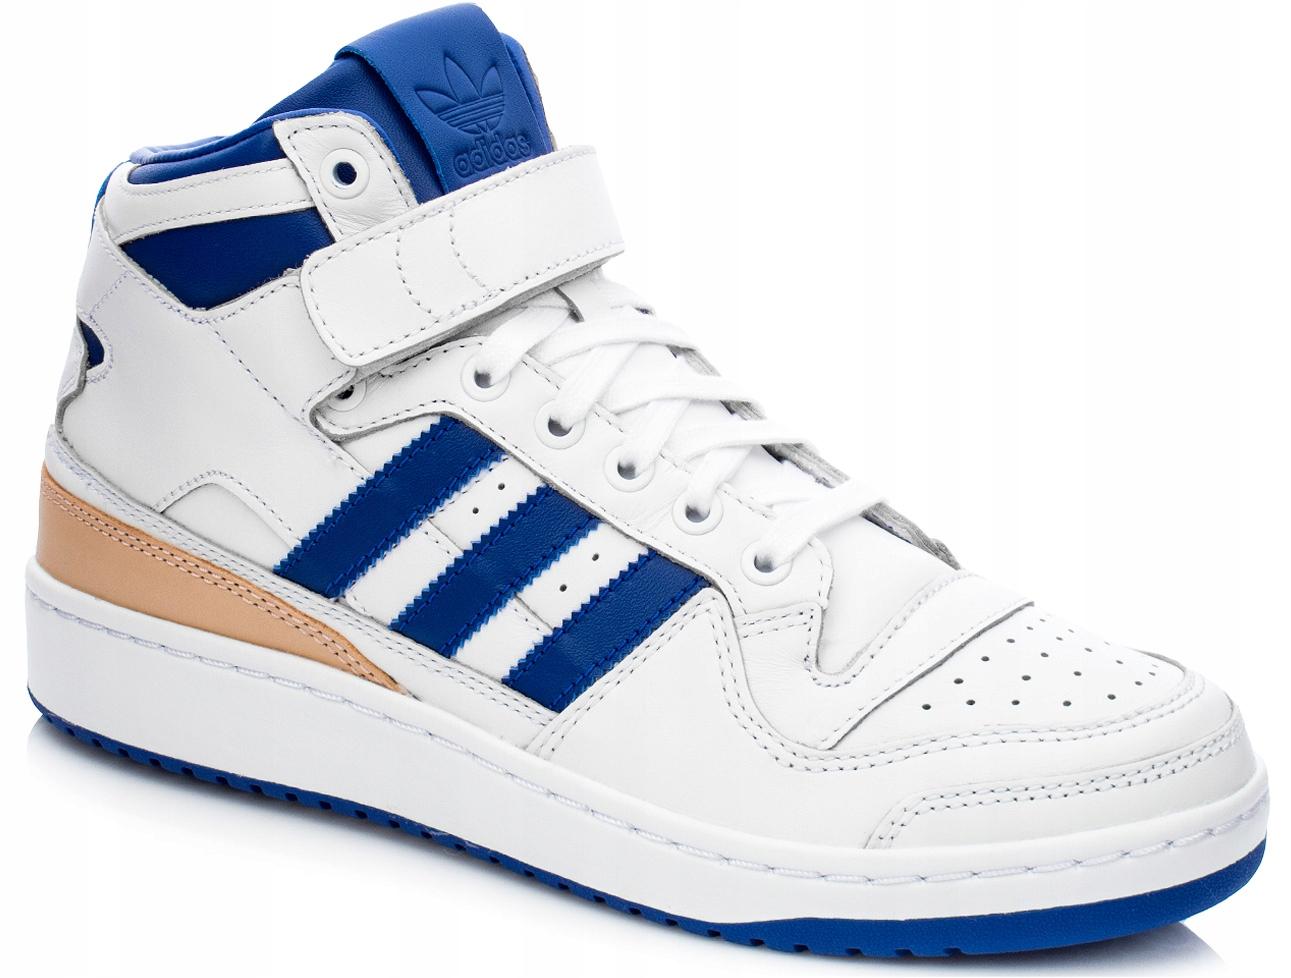 Buty Meskie Adidas Forum Mid By4412 R 41 1 3 7596204291 Allegro Pl